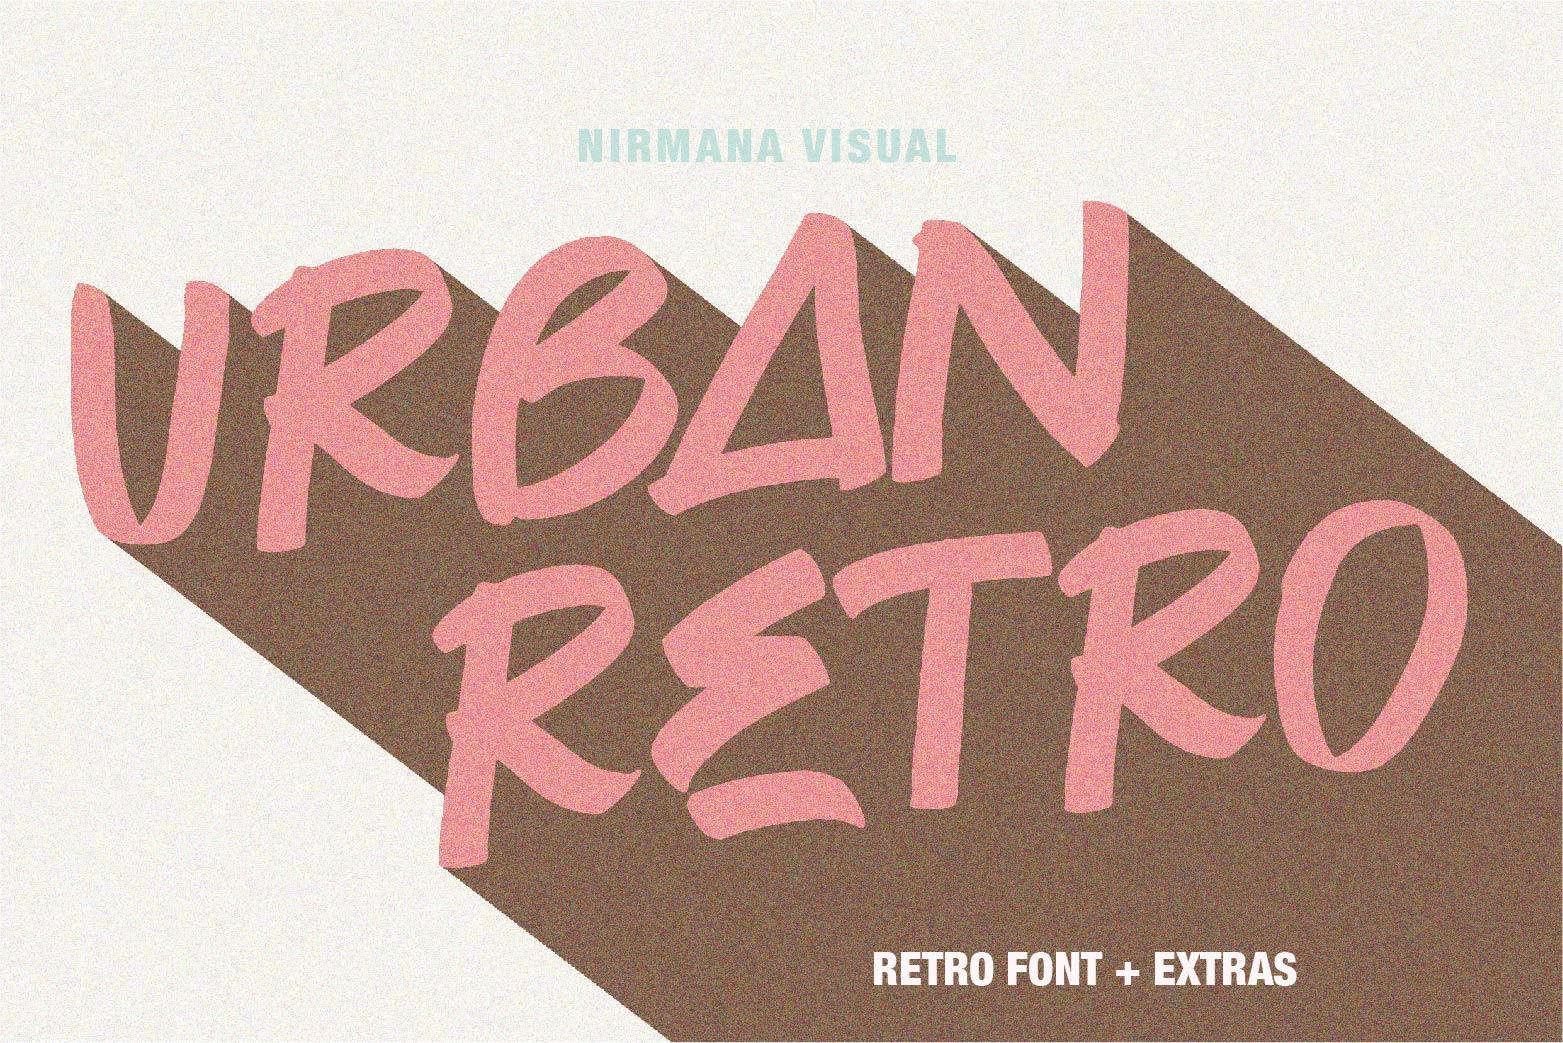 Urban Retro & Awesome Extra example image 1